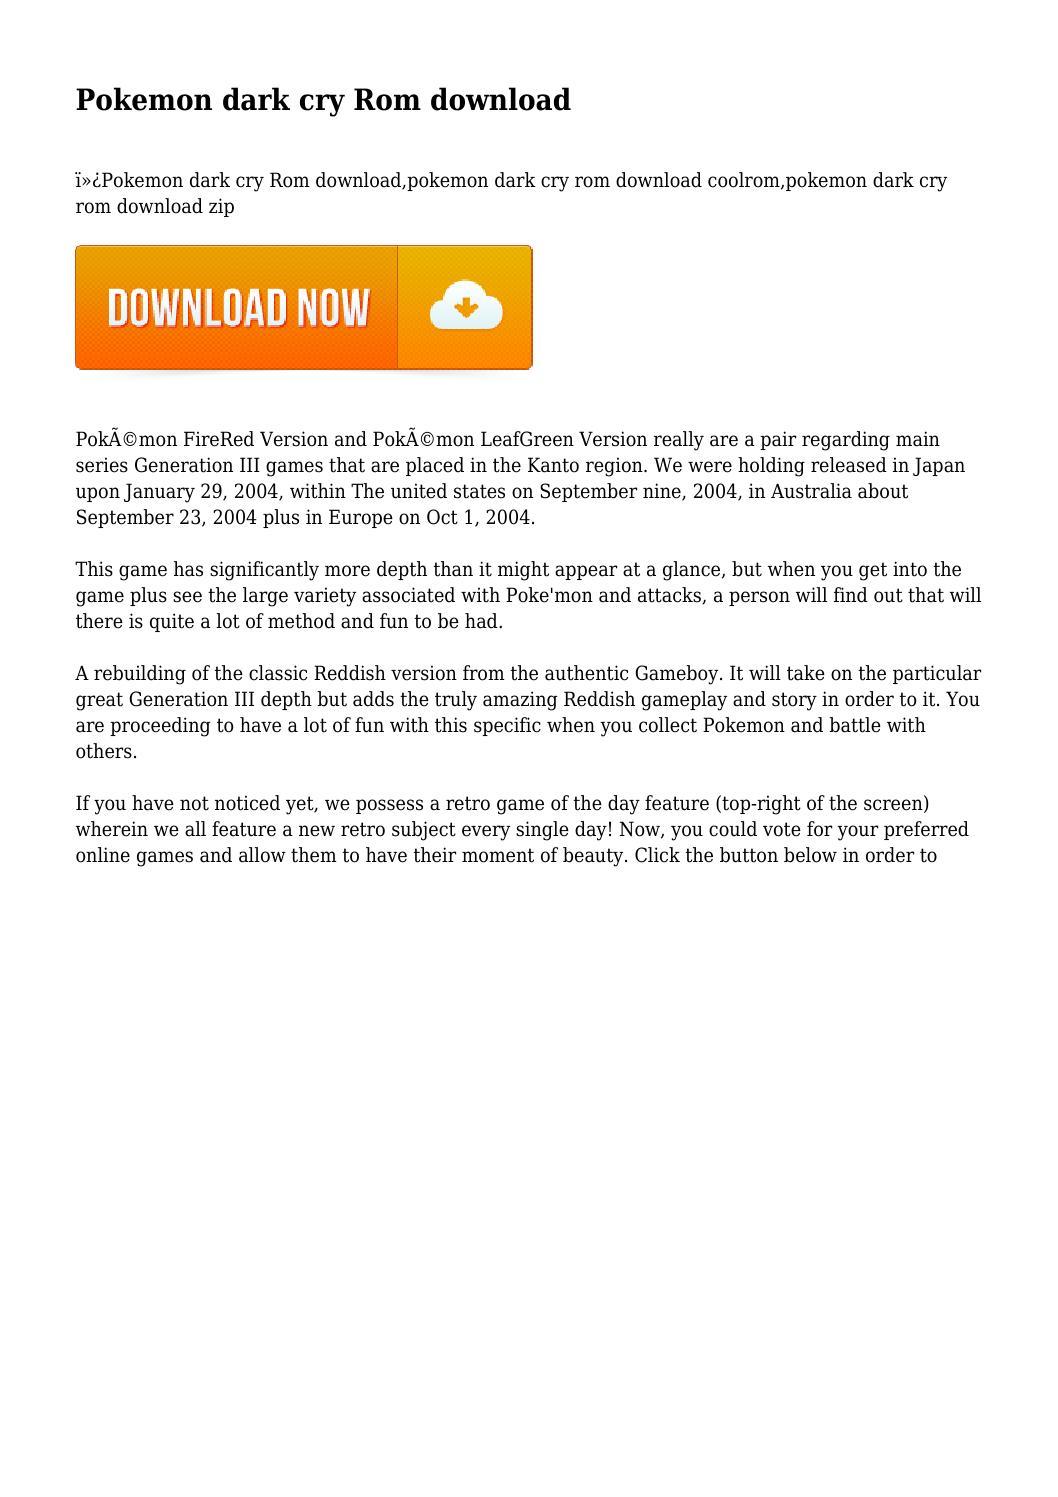 Pokemon dark cry legend of giratina gba zip download